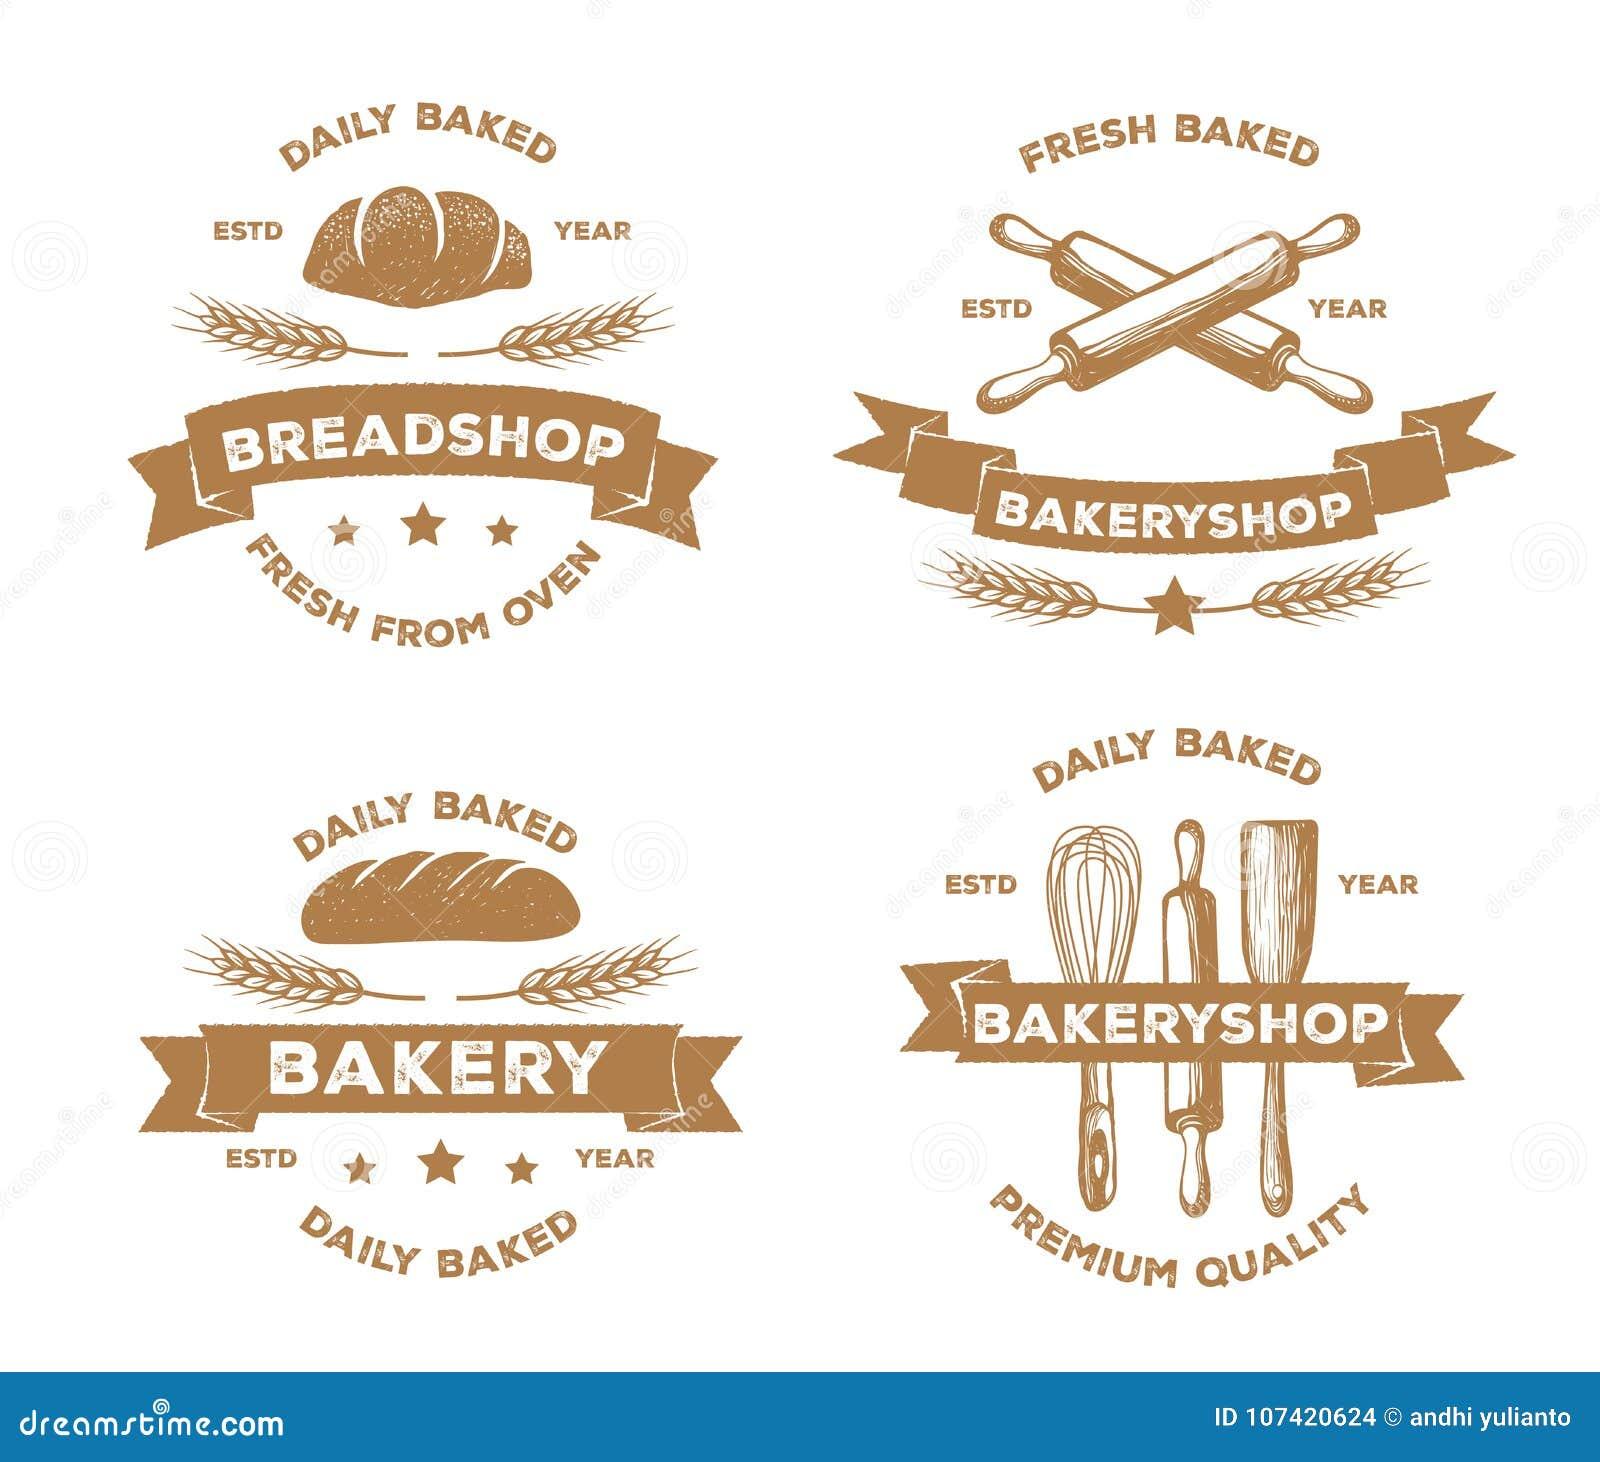 Vector logo design of bakery, bread shop, pastry